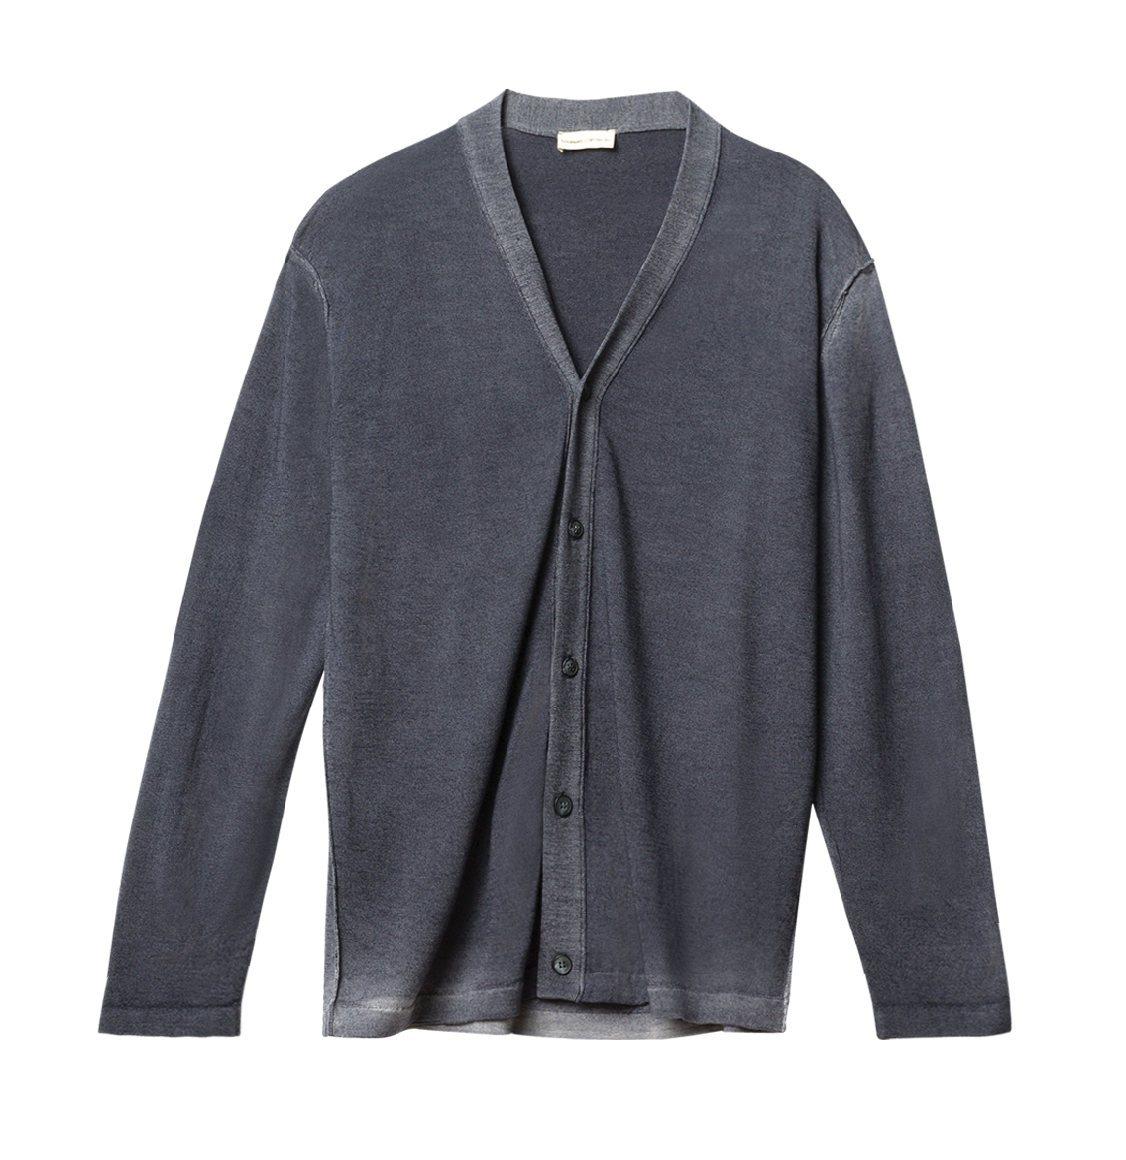 The Project Garments Oil Wash Virgin Wool Cardigan Grey